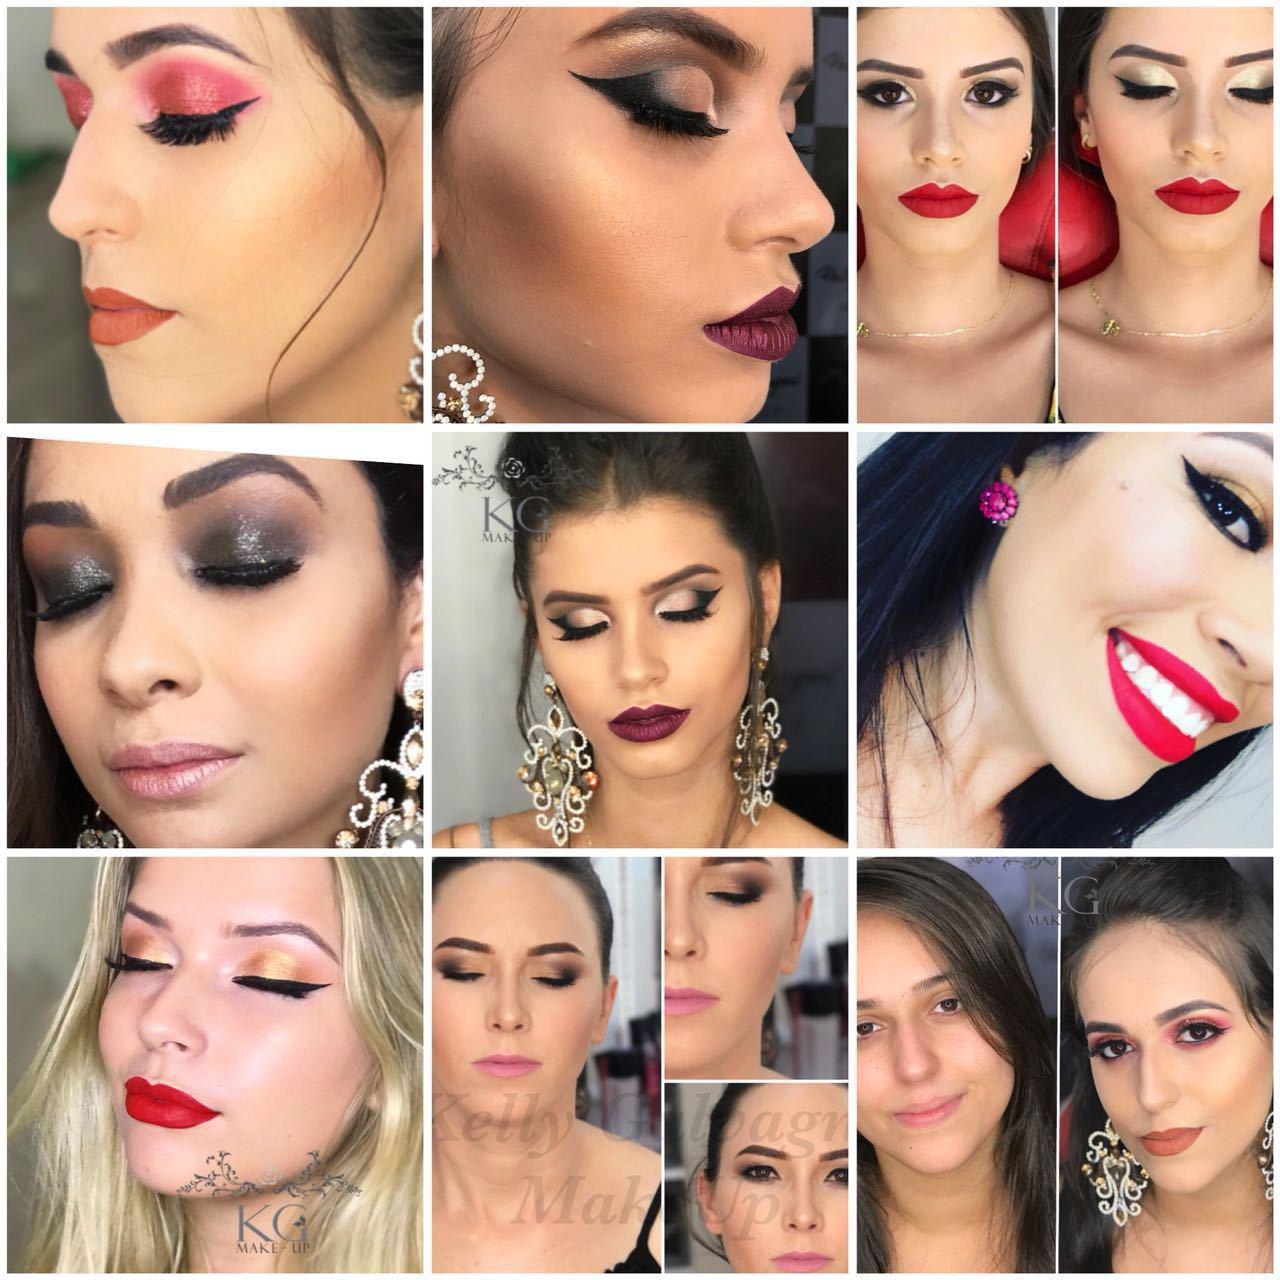 agende ja seu horario minha linda (38) 998174855 #kellygalvagniMakeup #heldermarucci #alcantaramakeup #hudabeauty #juviasplace #vegas_nay #edersonoliver_beauty #maquiadorabrasilia  maquiagem maquiador(a) designer de sobrancelhas